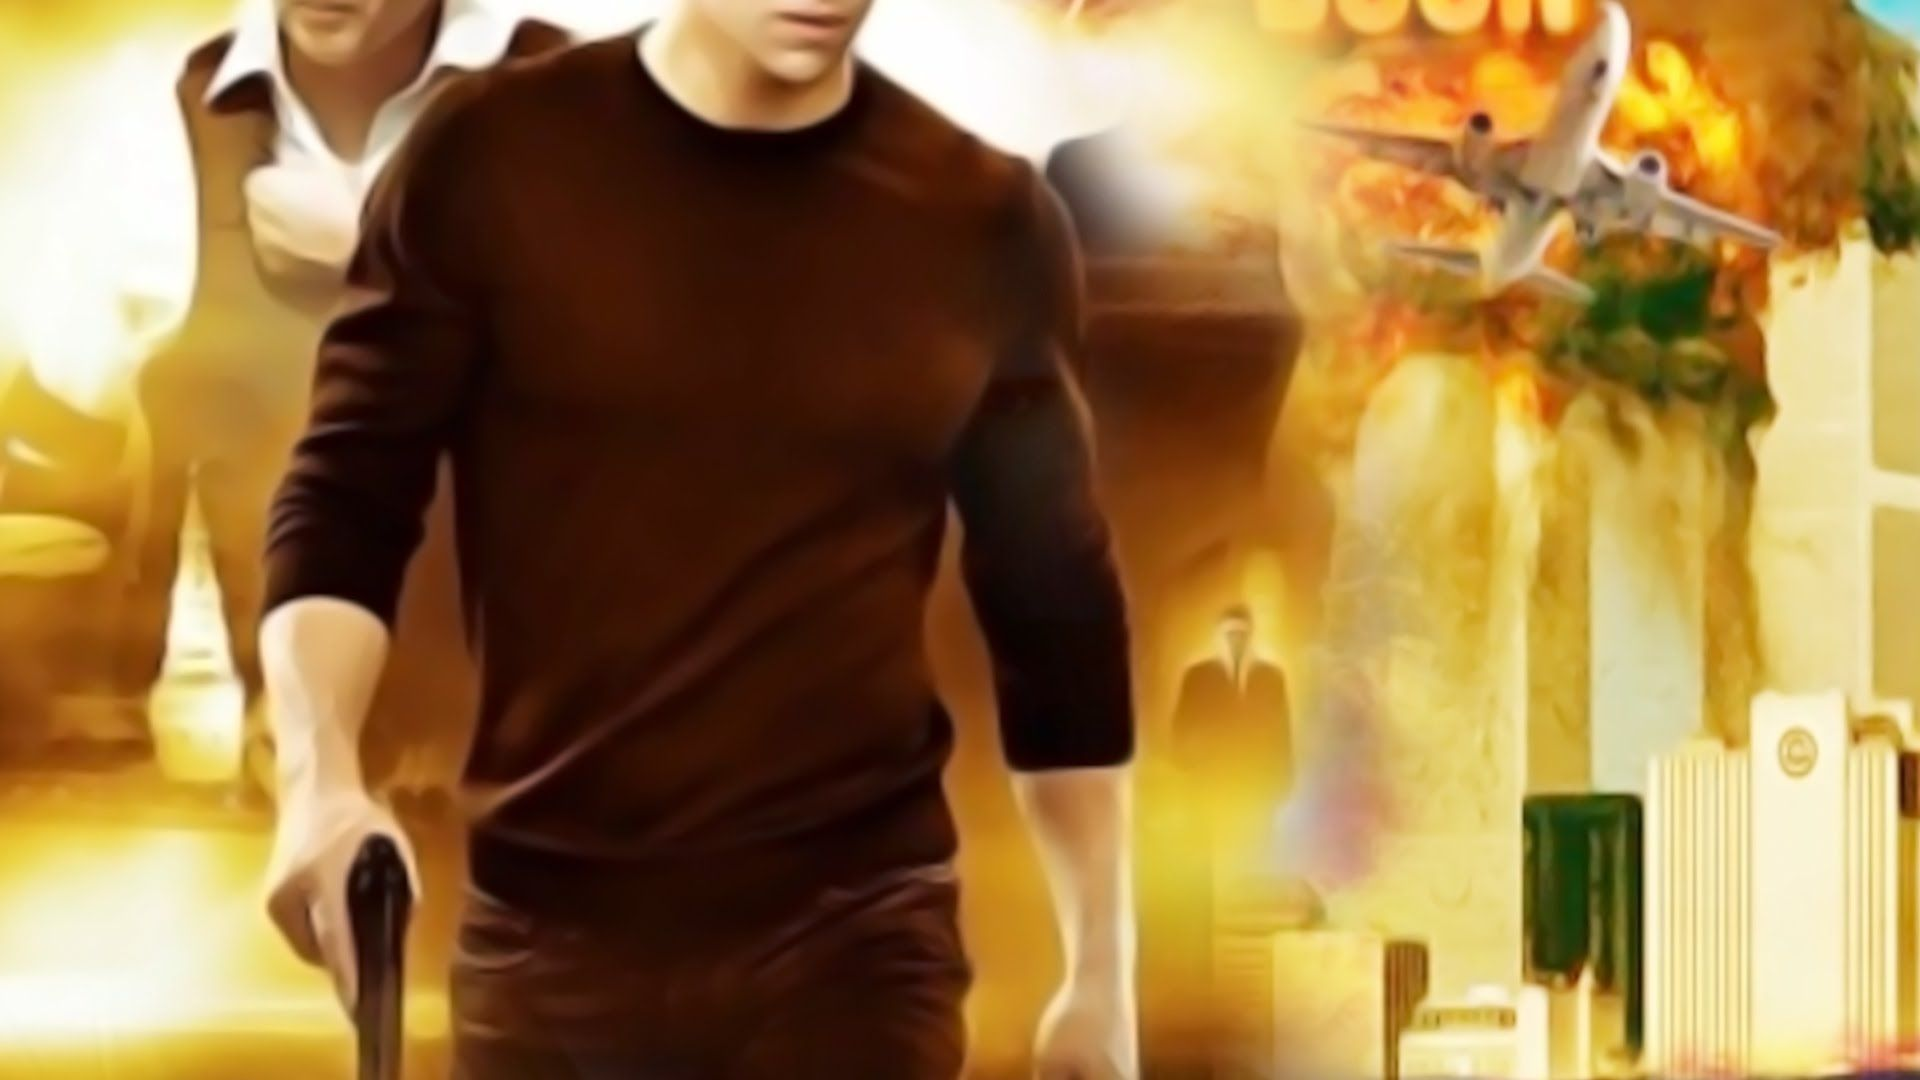 world of warcraft movie download in tamil